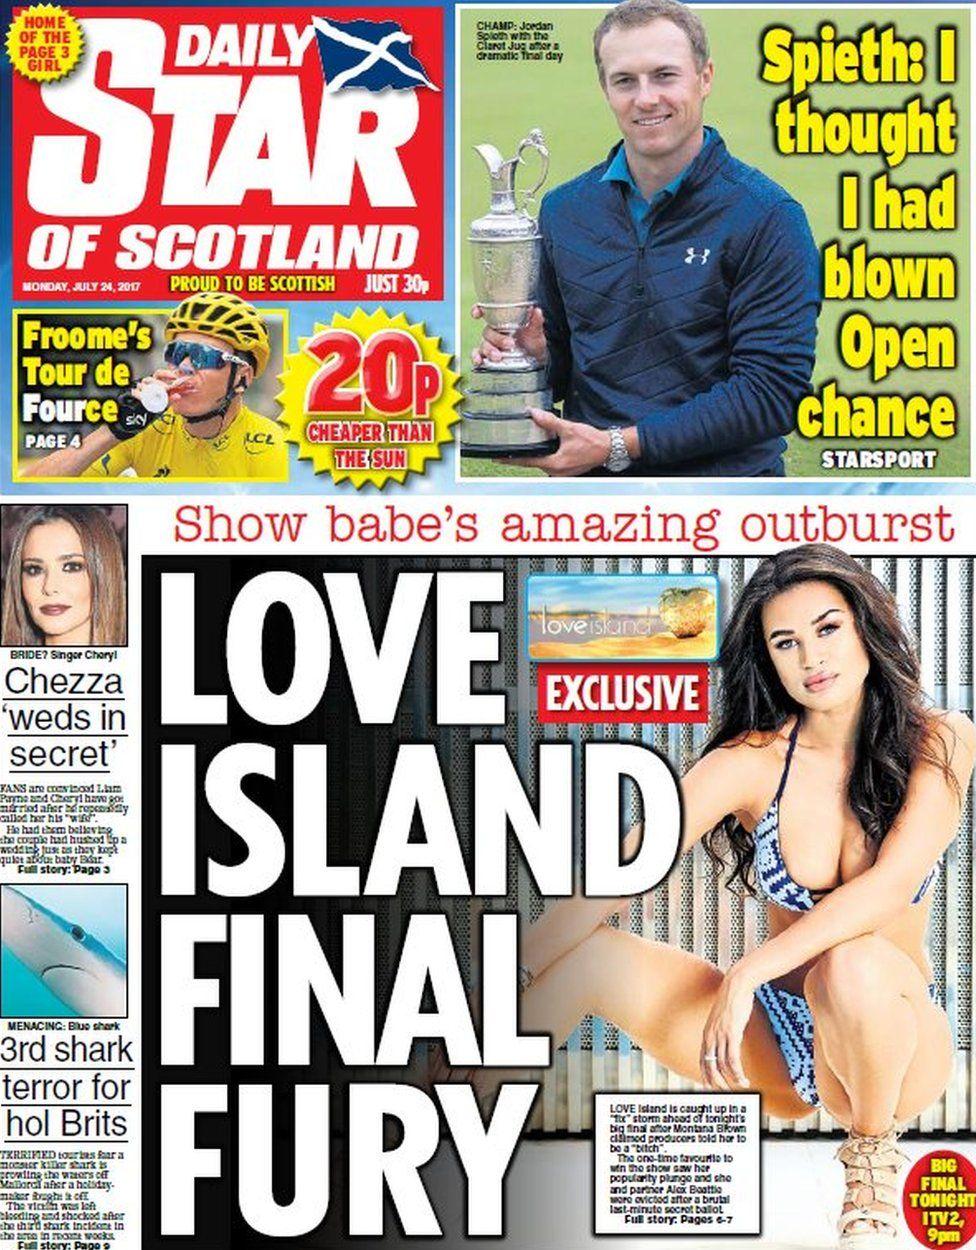 Daily Star Scotland